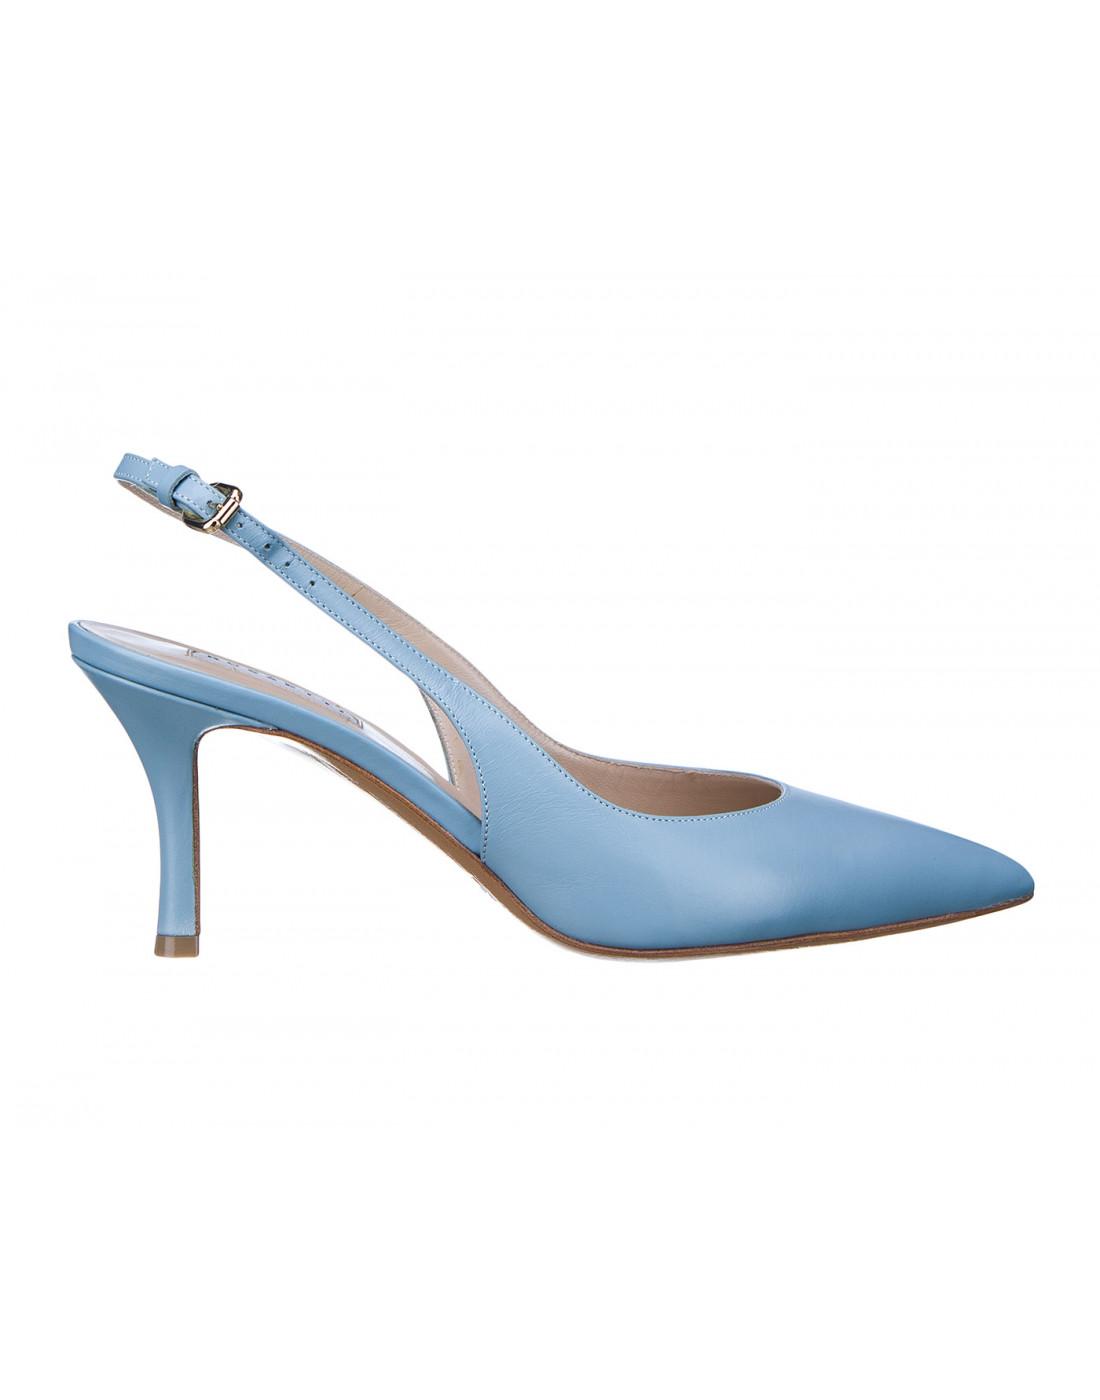 Босоножки голубые женские Fratelli Rossetti S66267-1